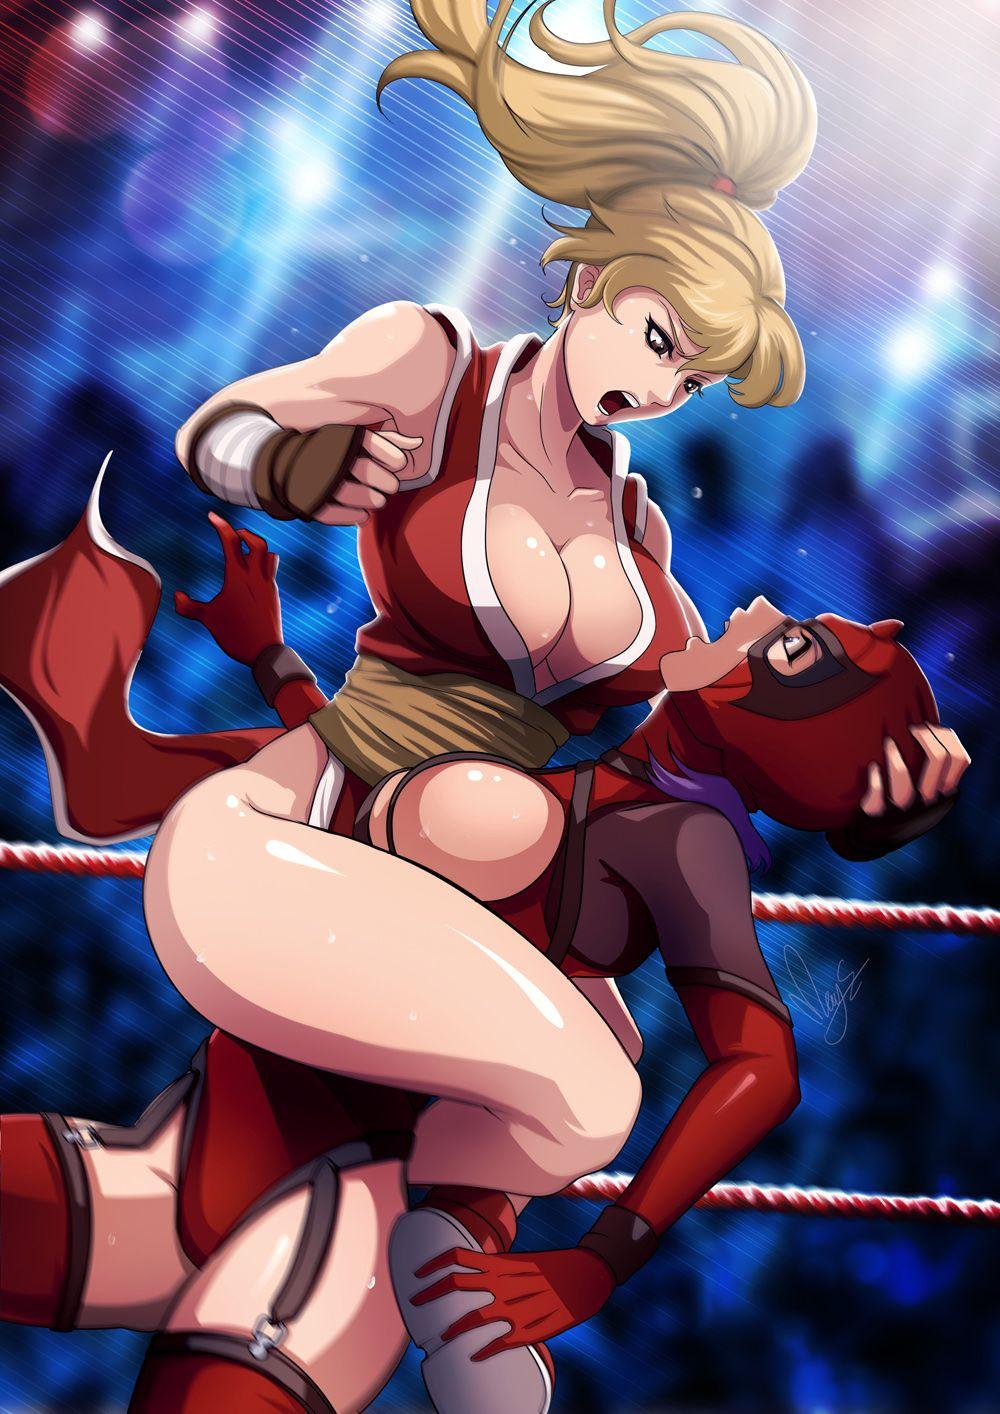 Sexy anime girls wrestling